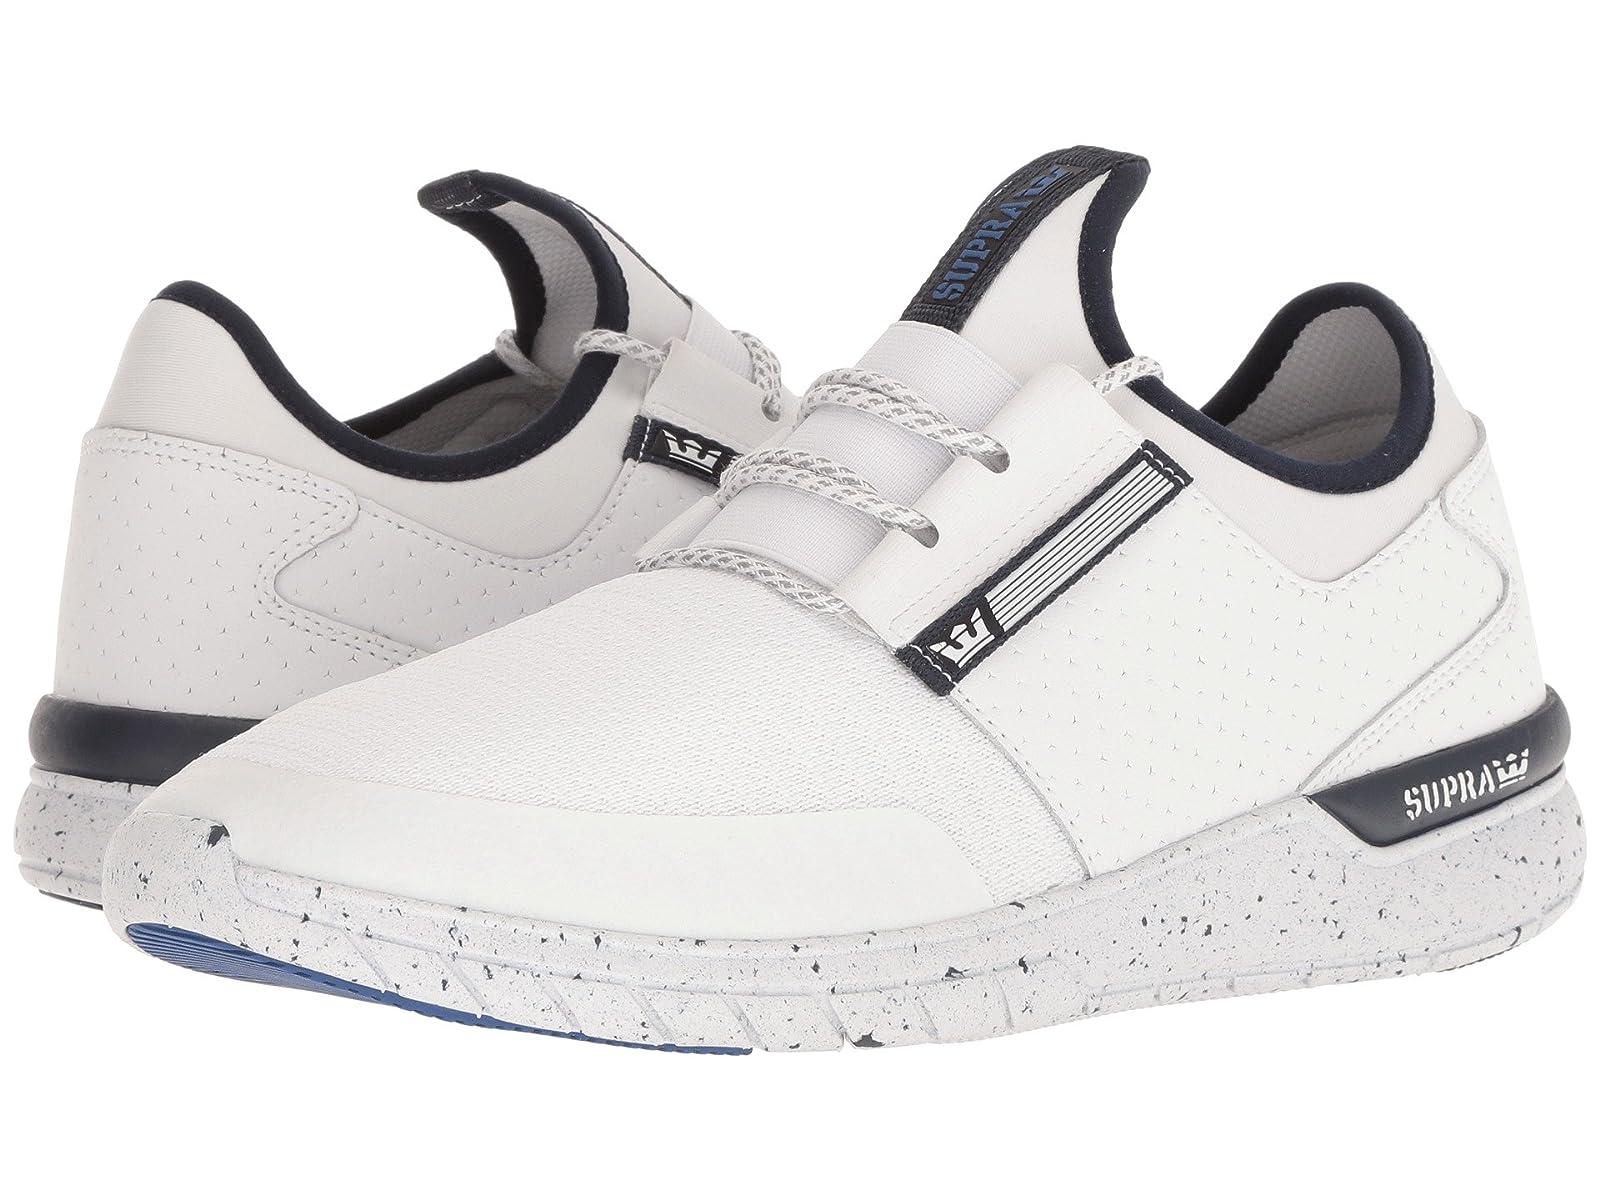 Supra Flow RunAtmospheric grades have affordable shoes